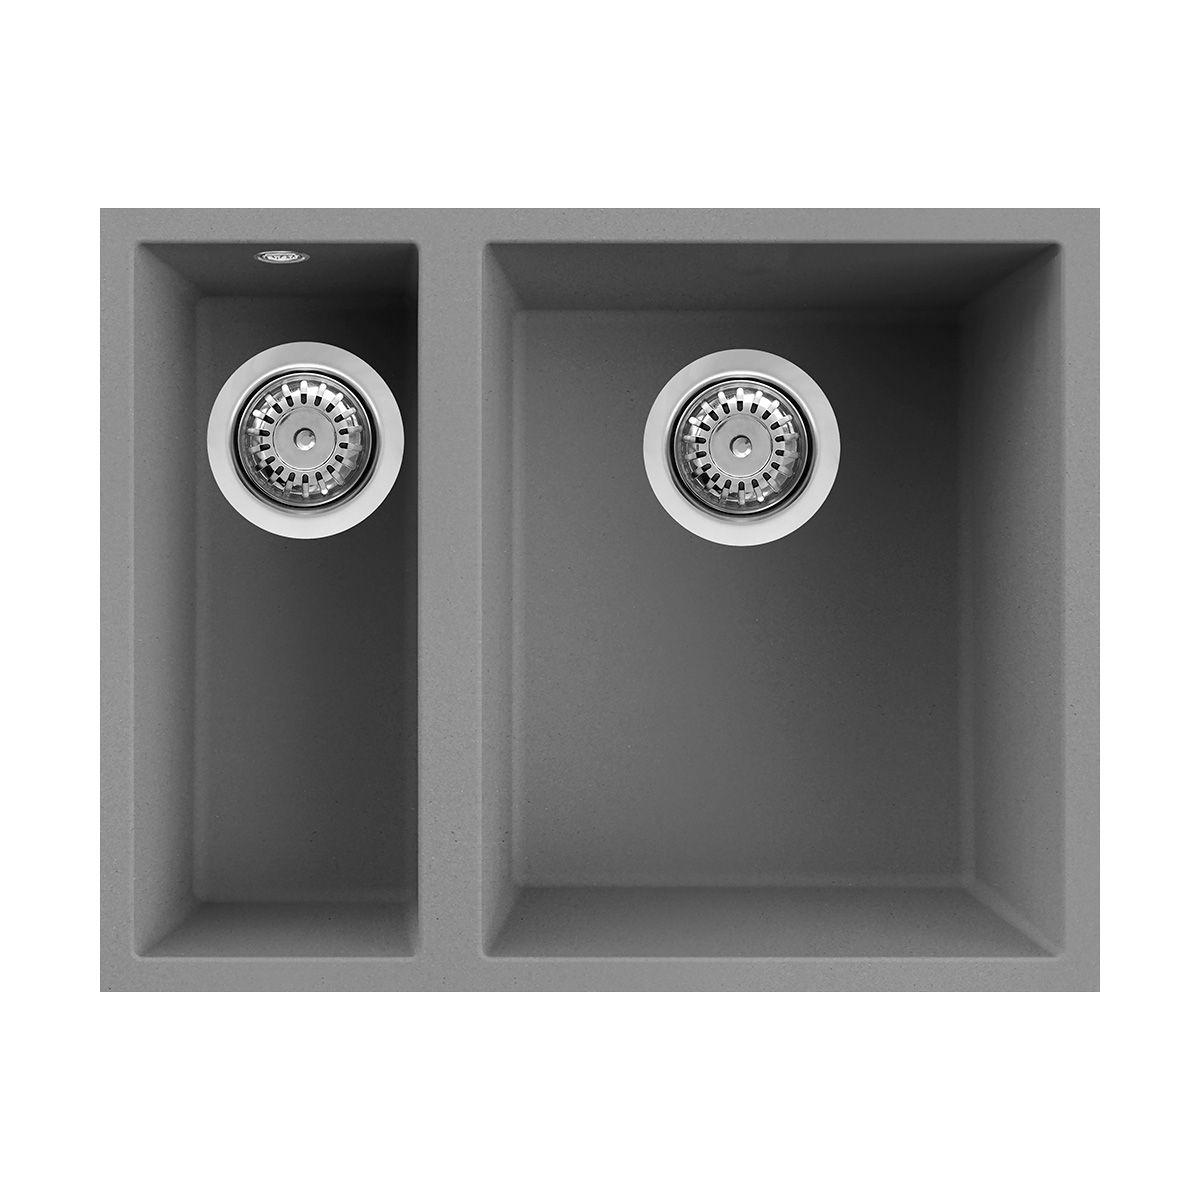 Reginox Quadra 150 Undermount 1 5 Bowl Granite Kitchen Sink Sinks Taps Com